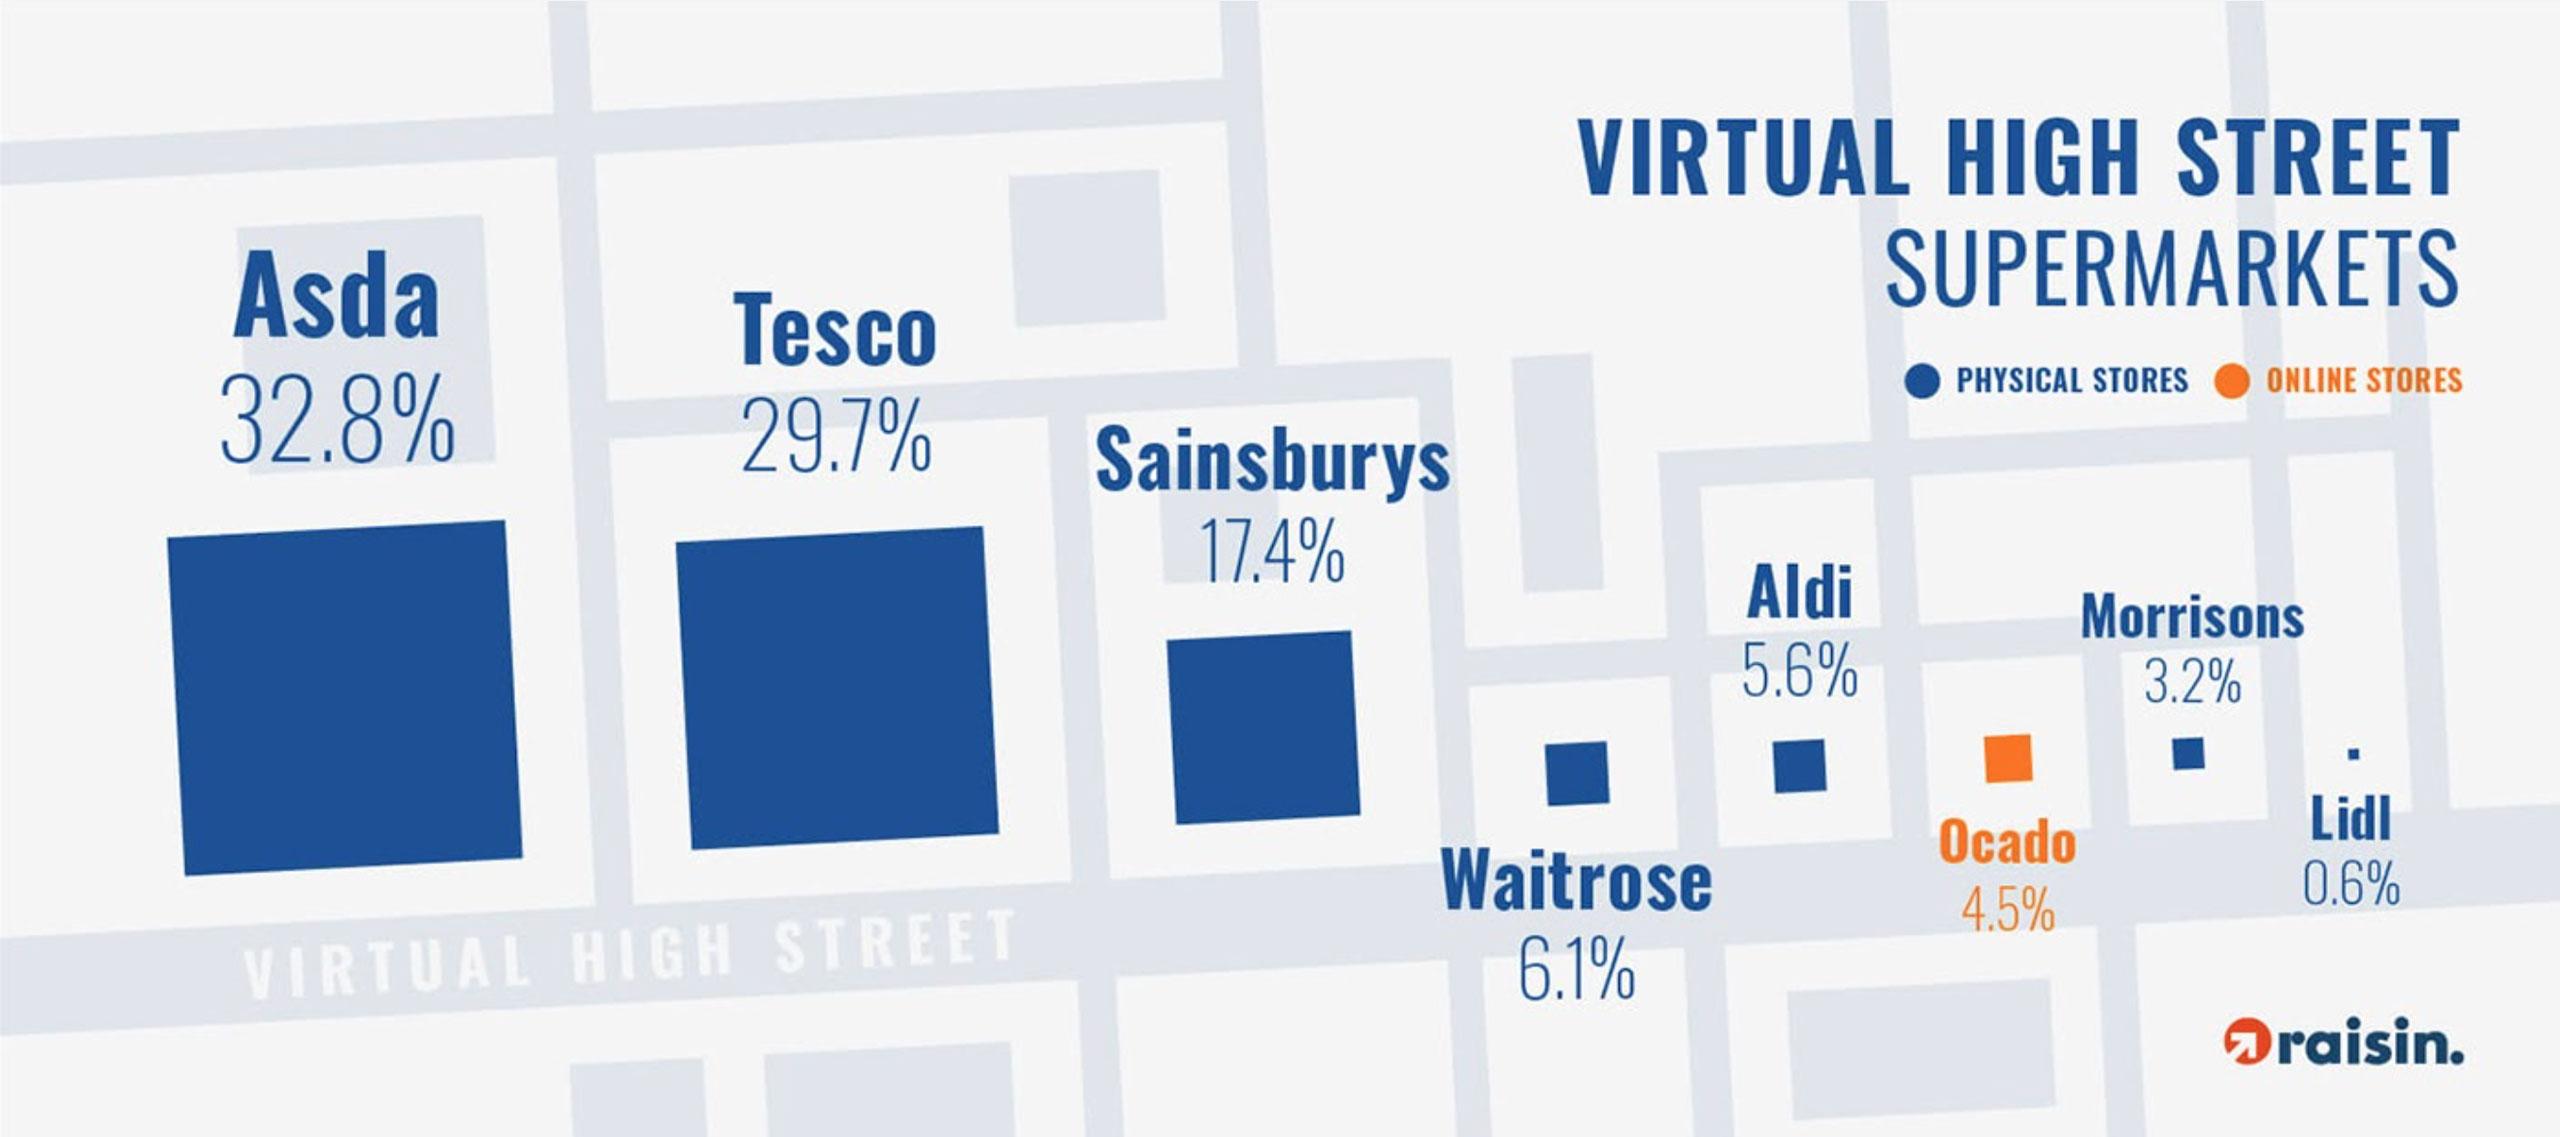 Virtual high street - supermarkets